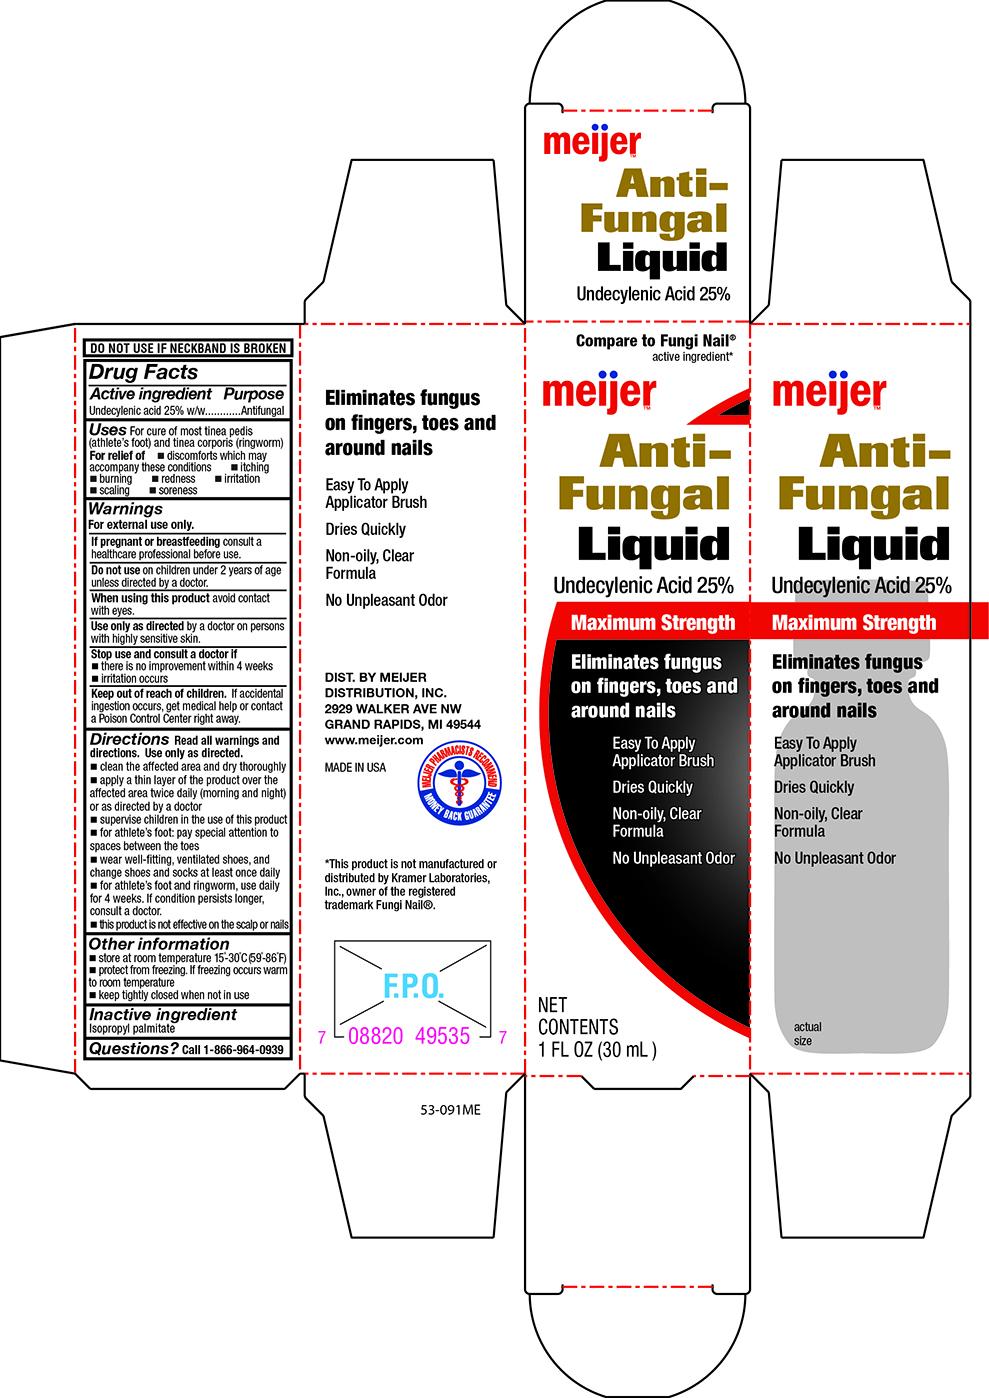 meijer Antifungal Nail Liquid Box.jpg